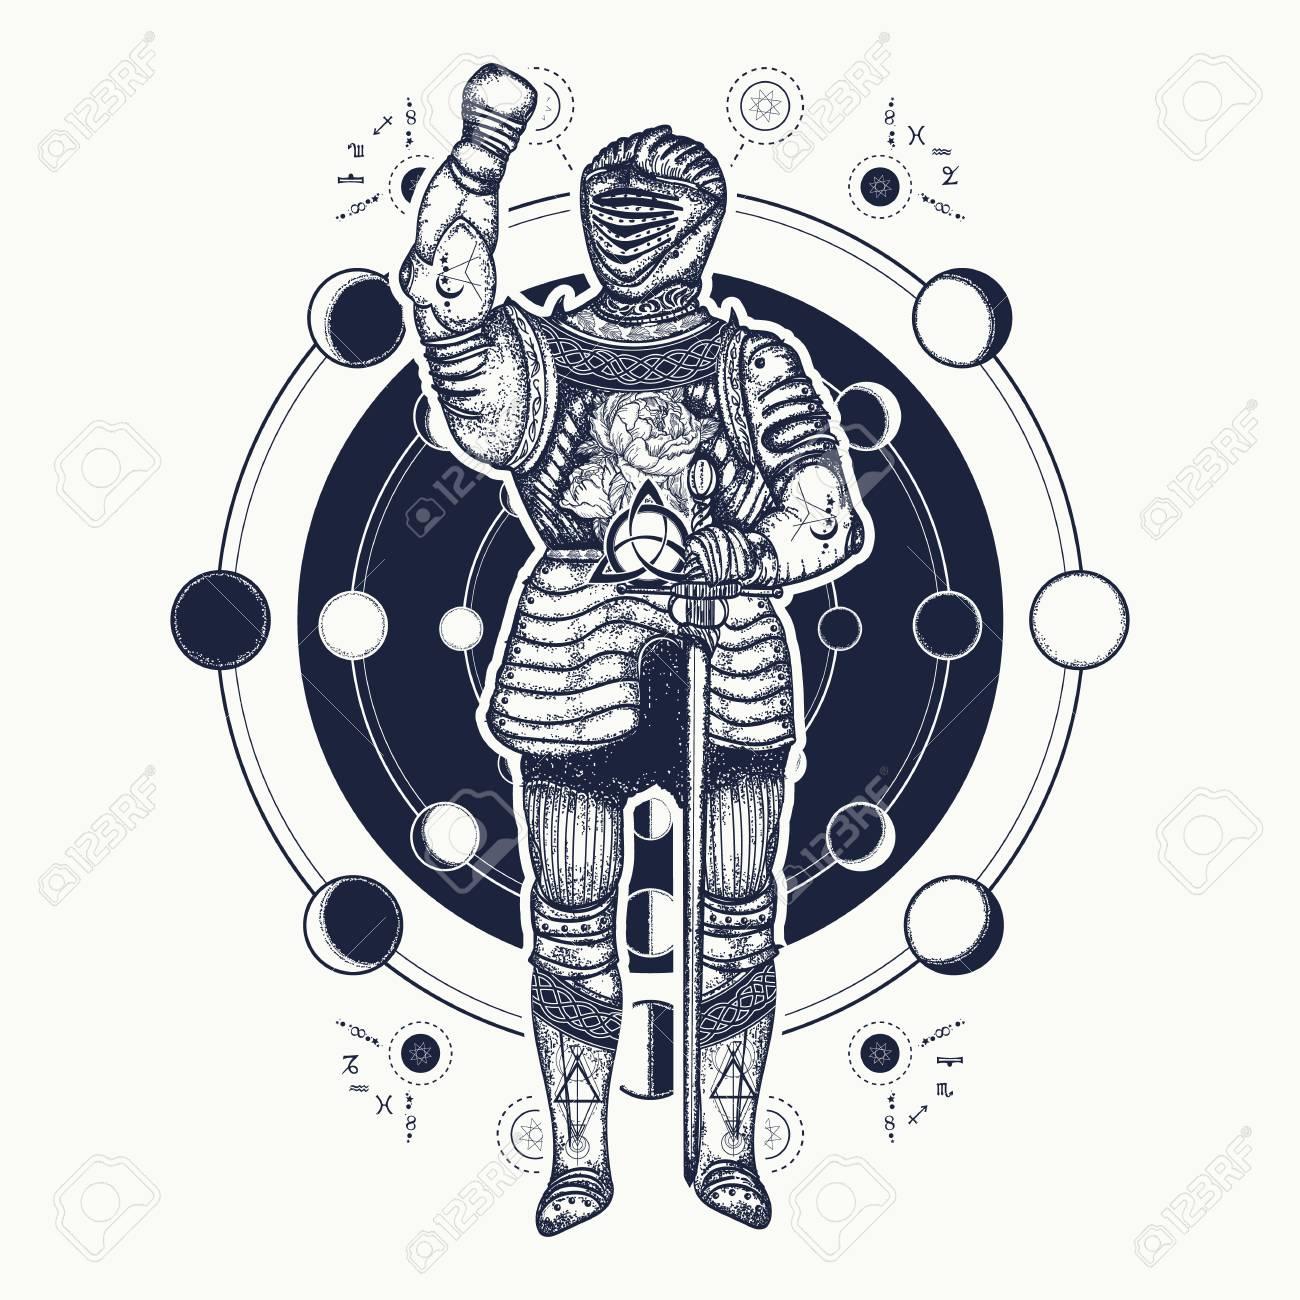 c12135a4b8a9b Medieval knight tattoo art. Esoteric symbol ancient war, lunar phases.  Alchemical motives,